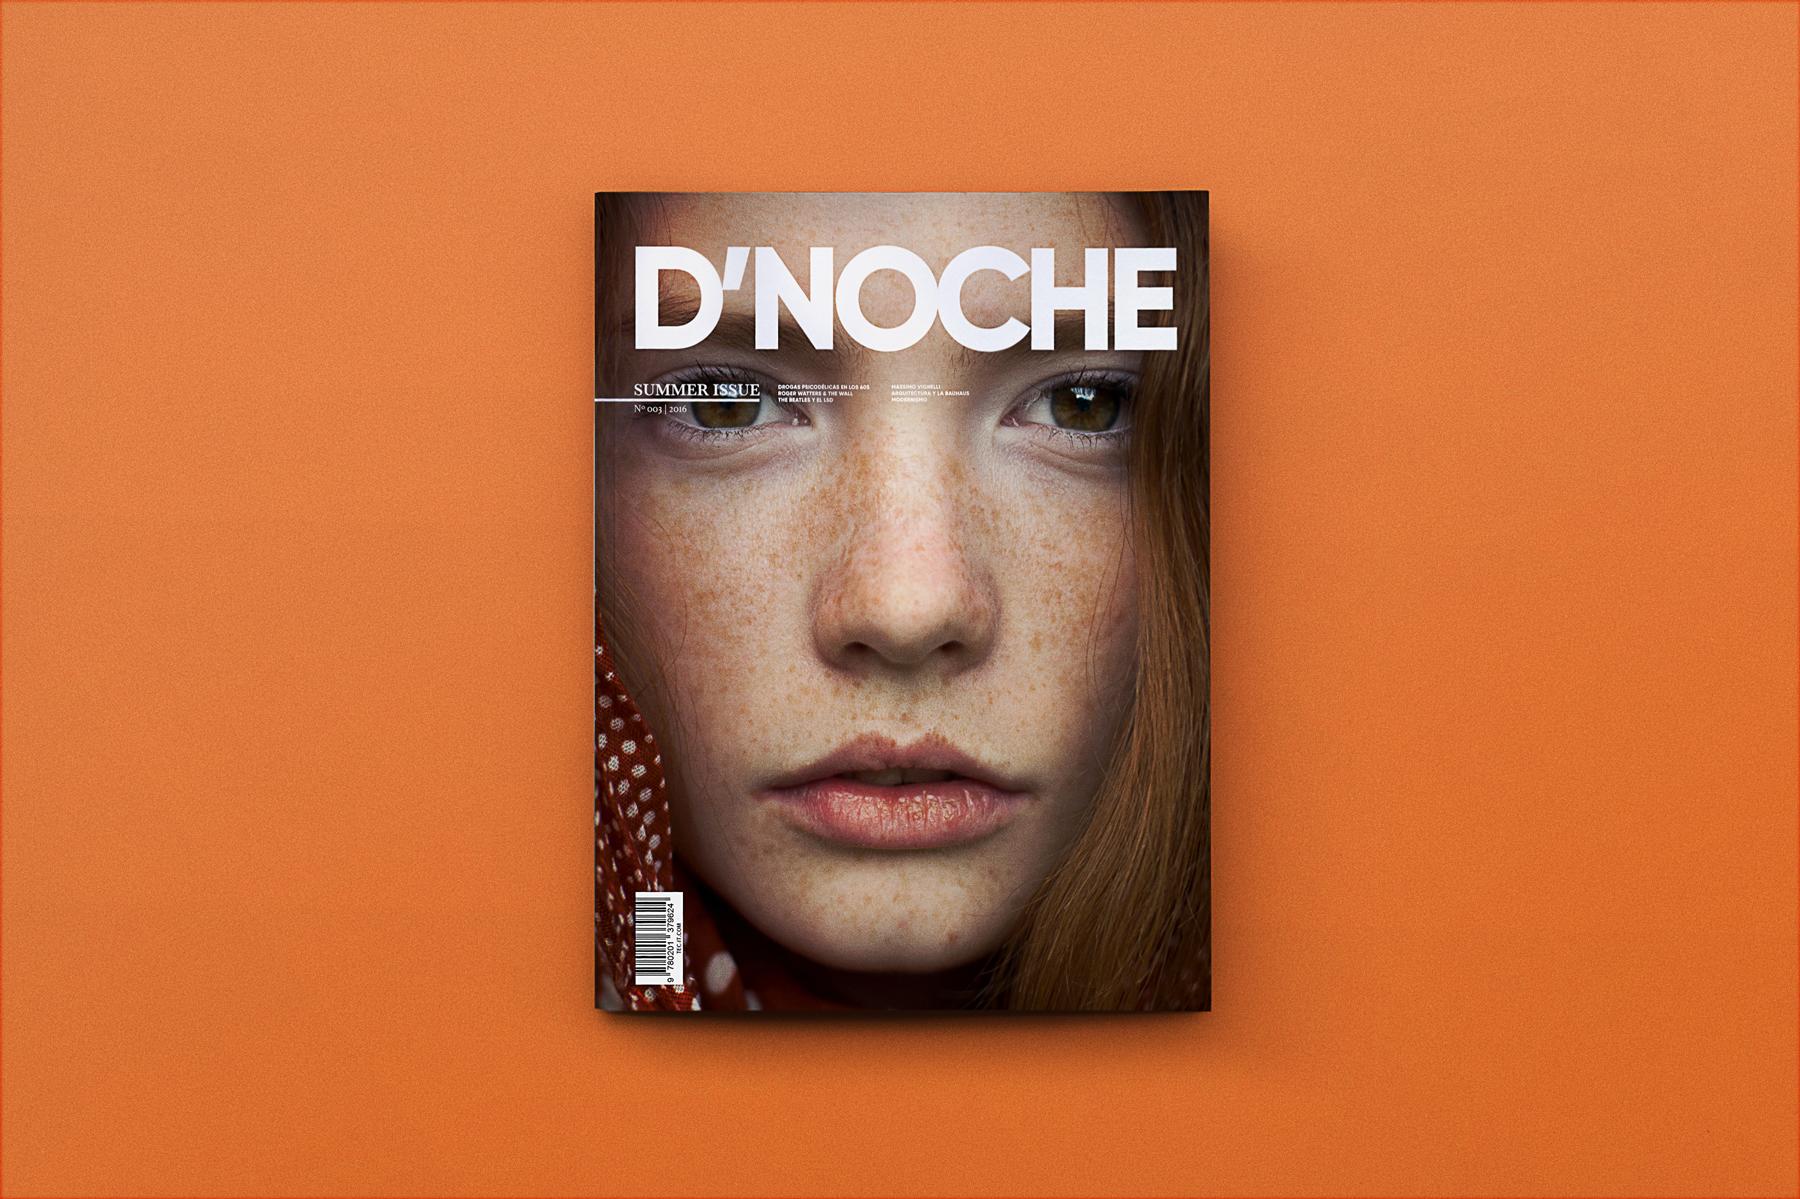 D'noche magazine